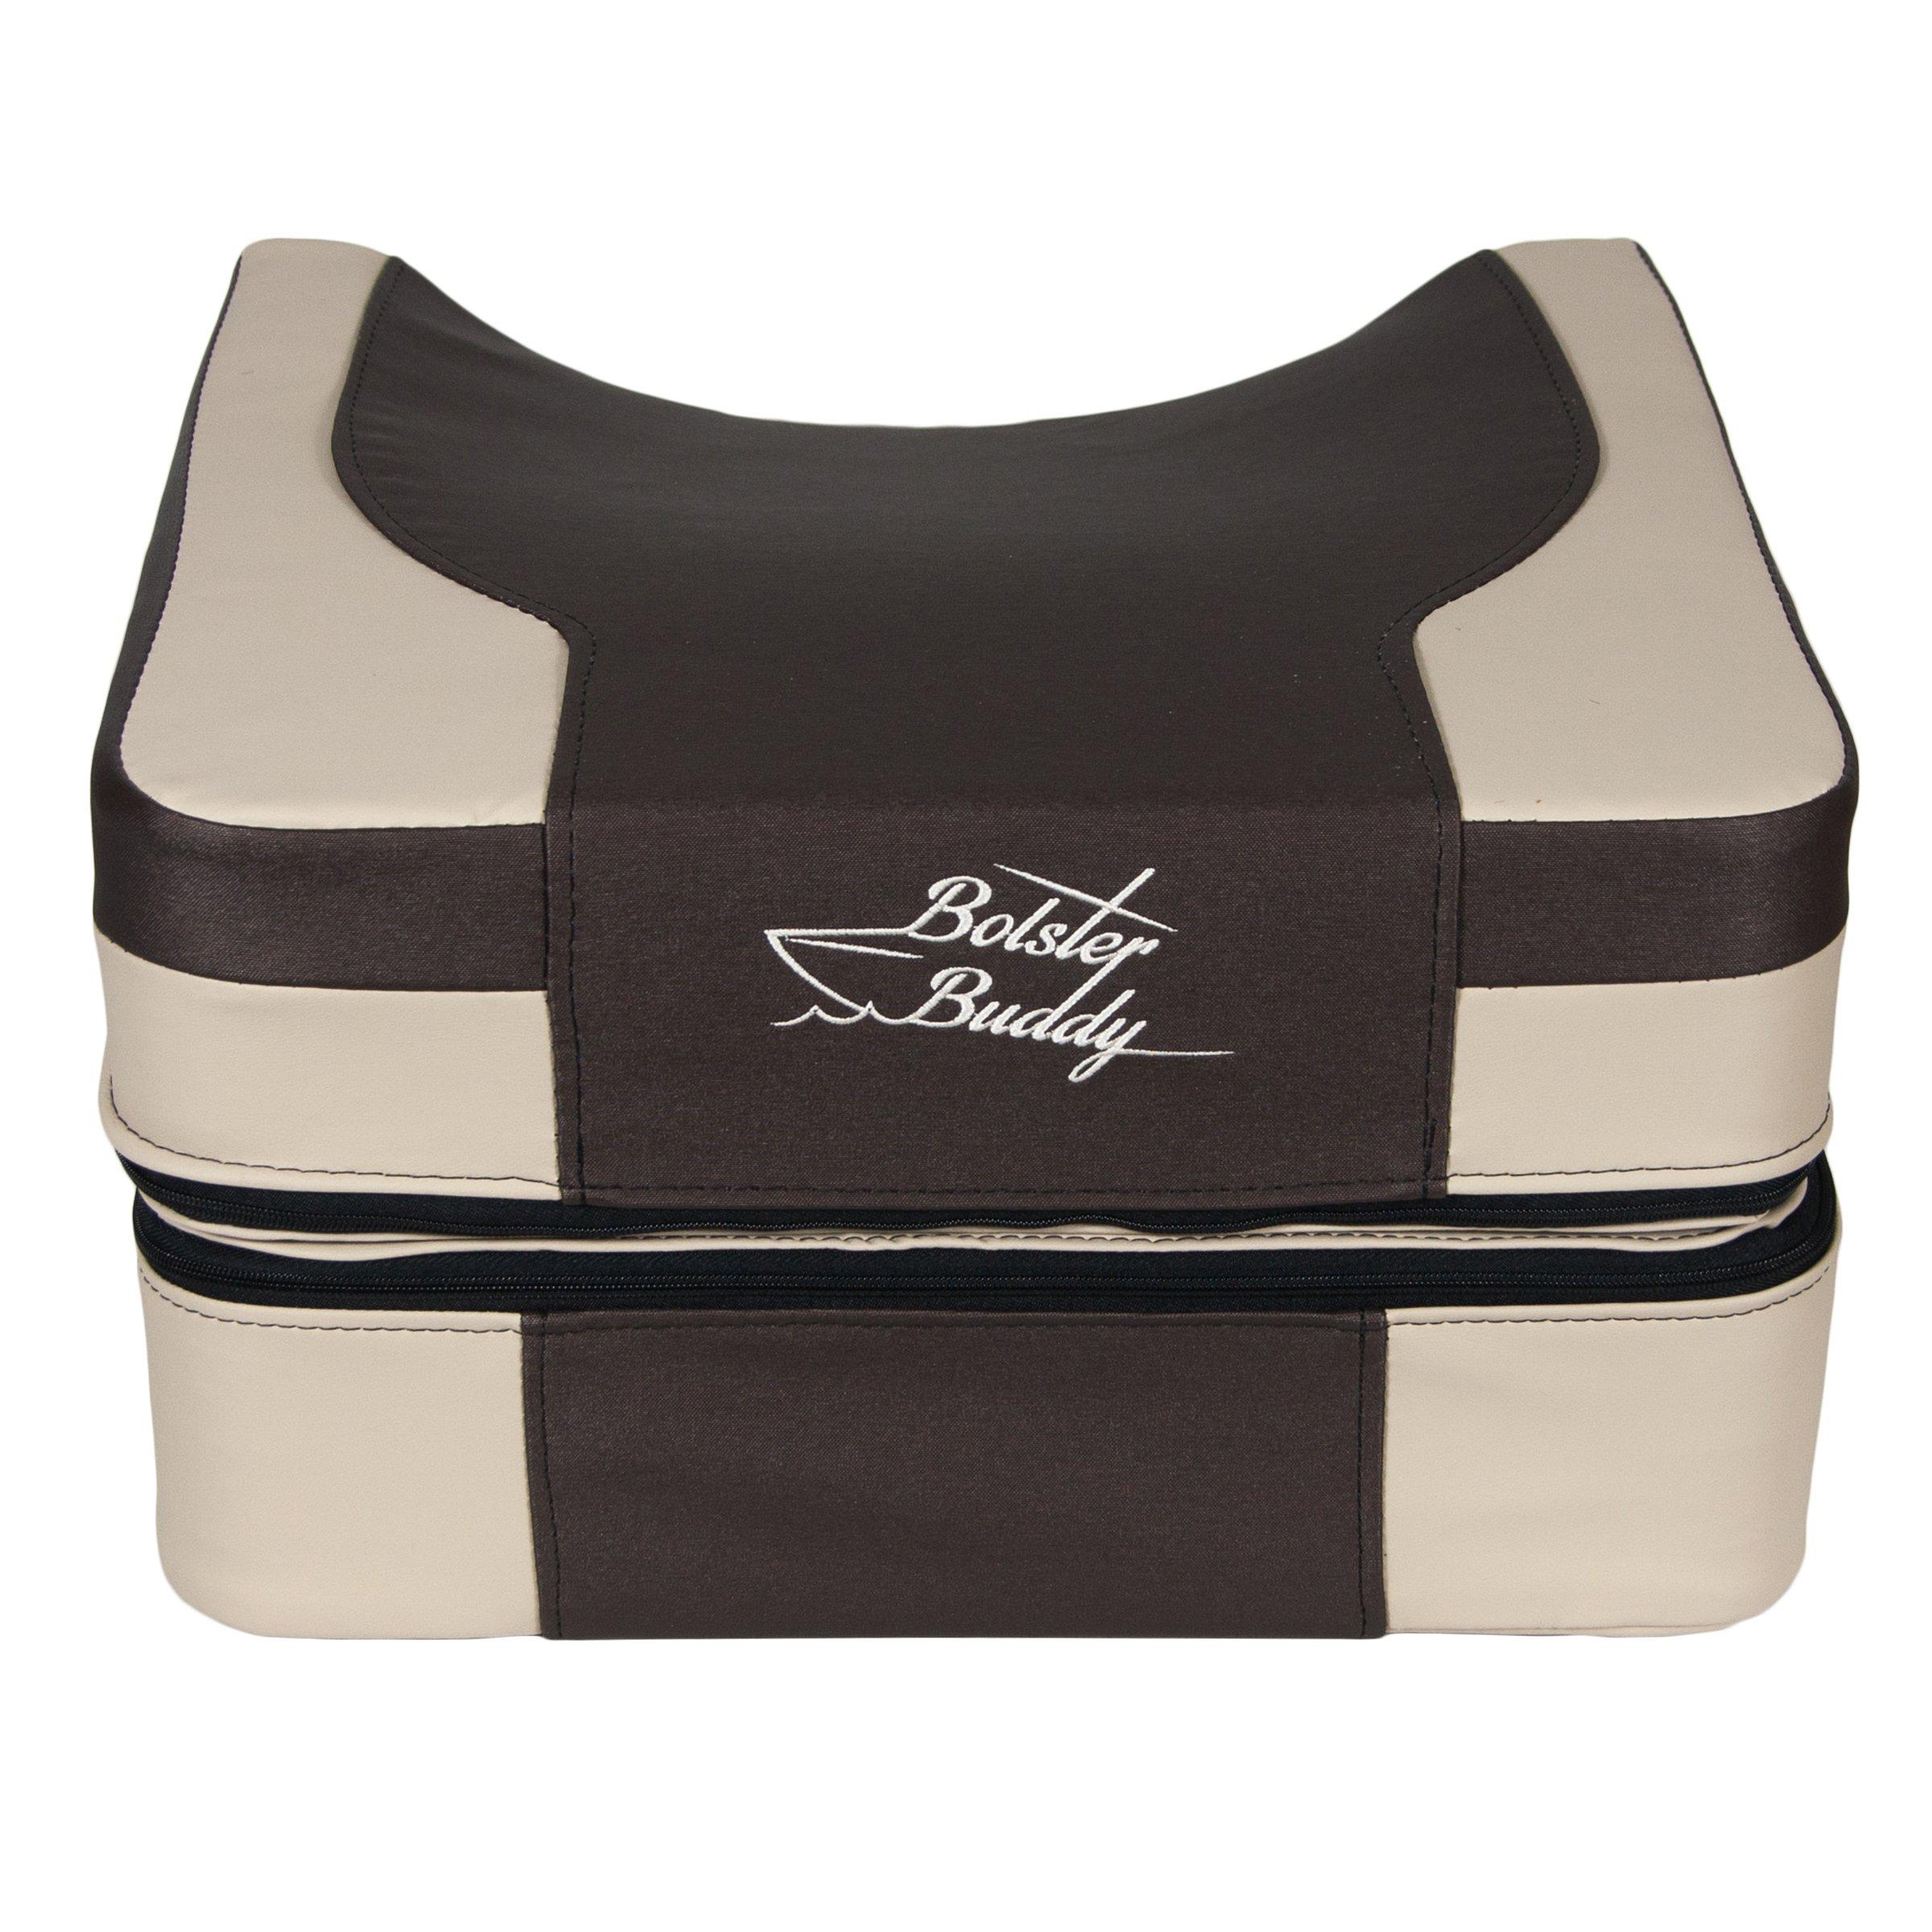 Bolster Buddy Quality Boat Seat Cushion (Mocha) (X-Large) by Bolster Buddy